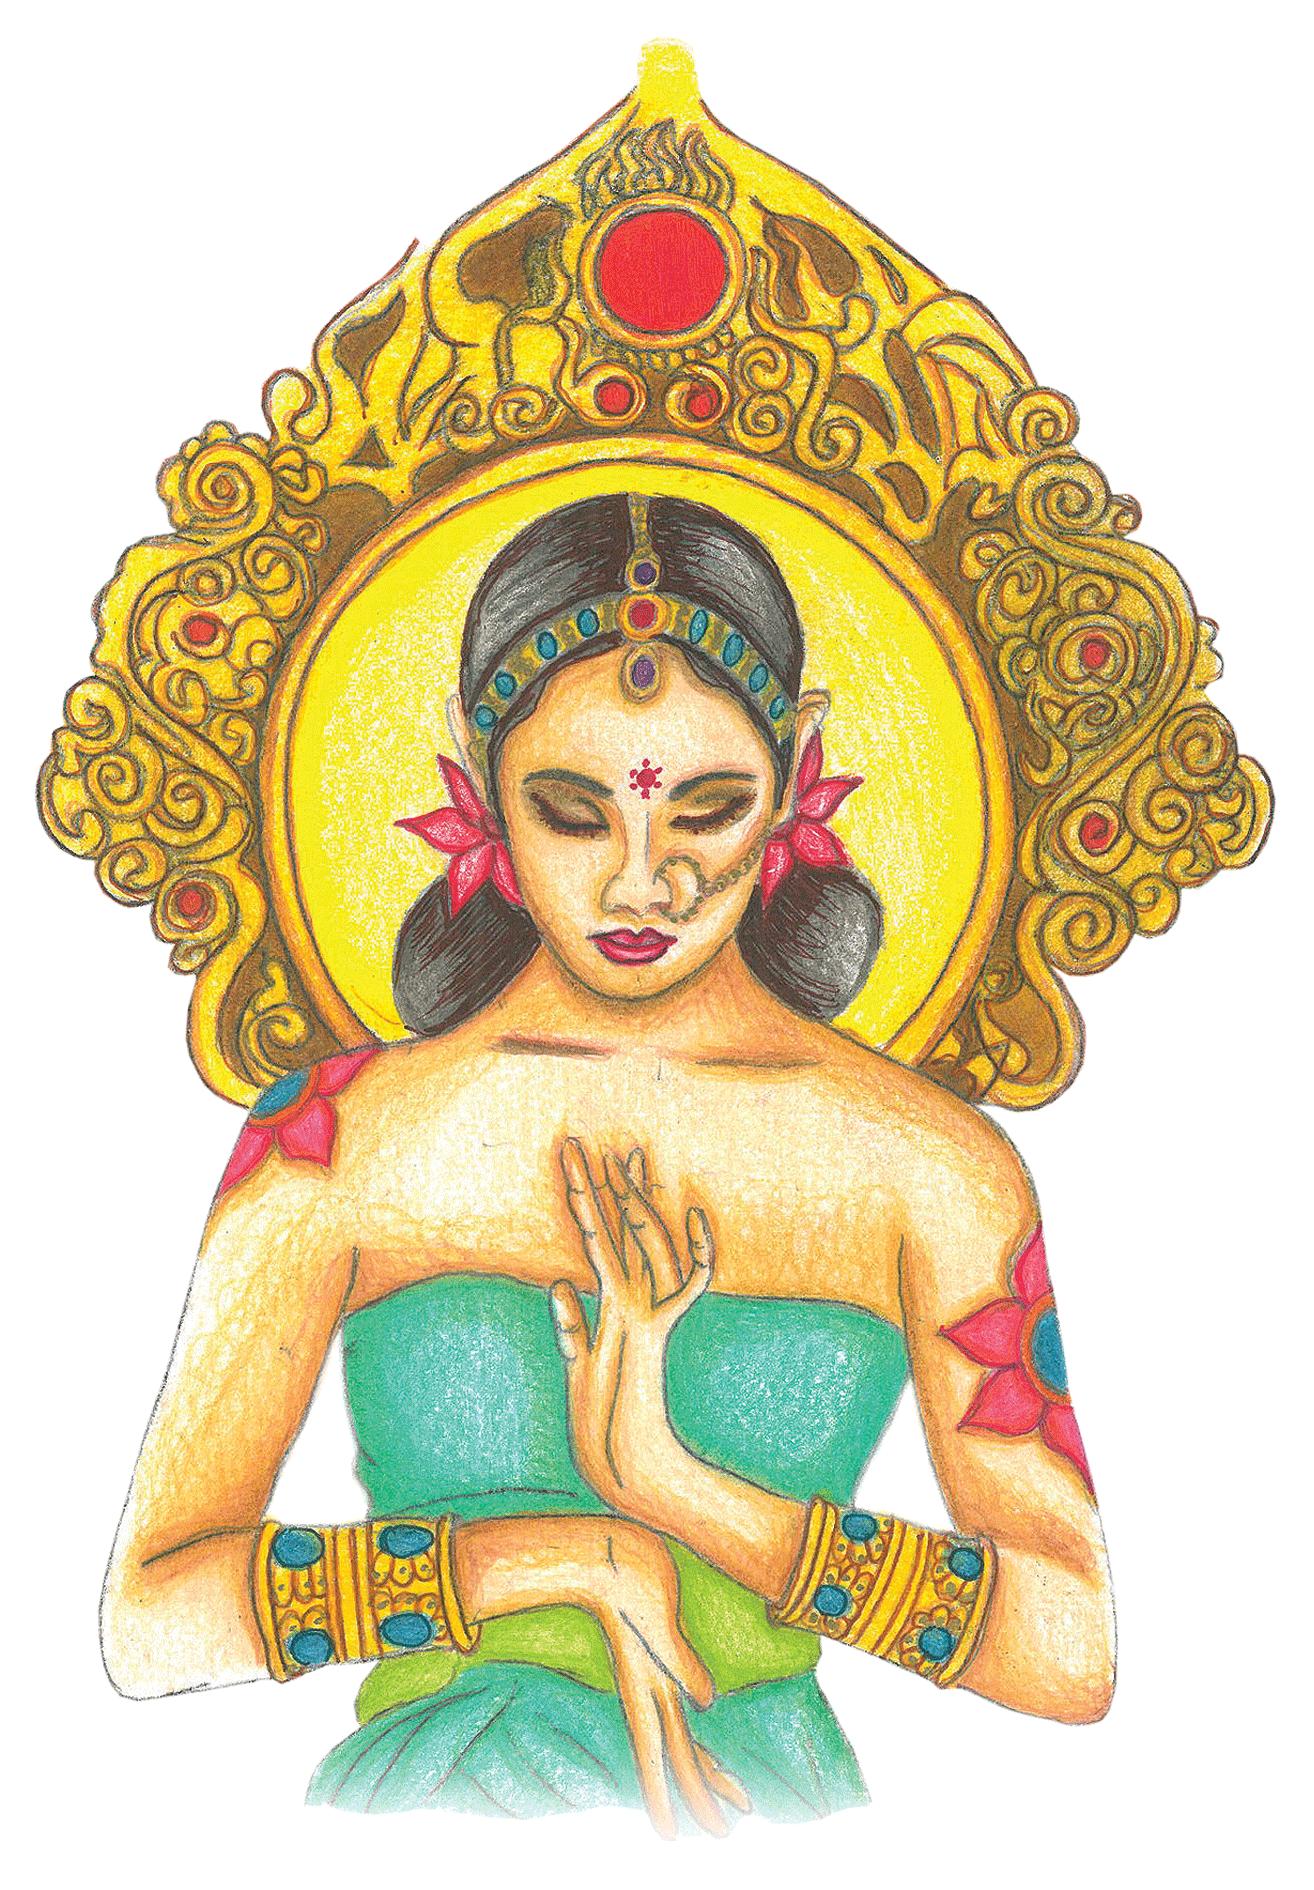 https://www.sujatanandy.com